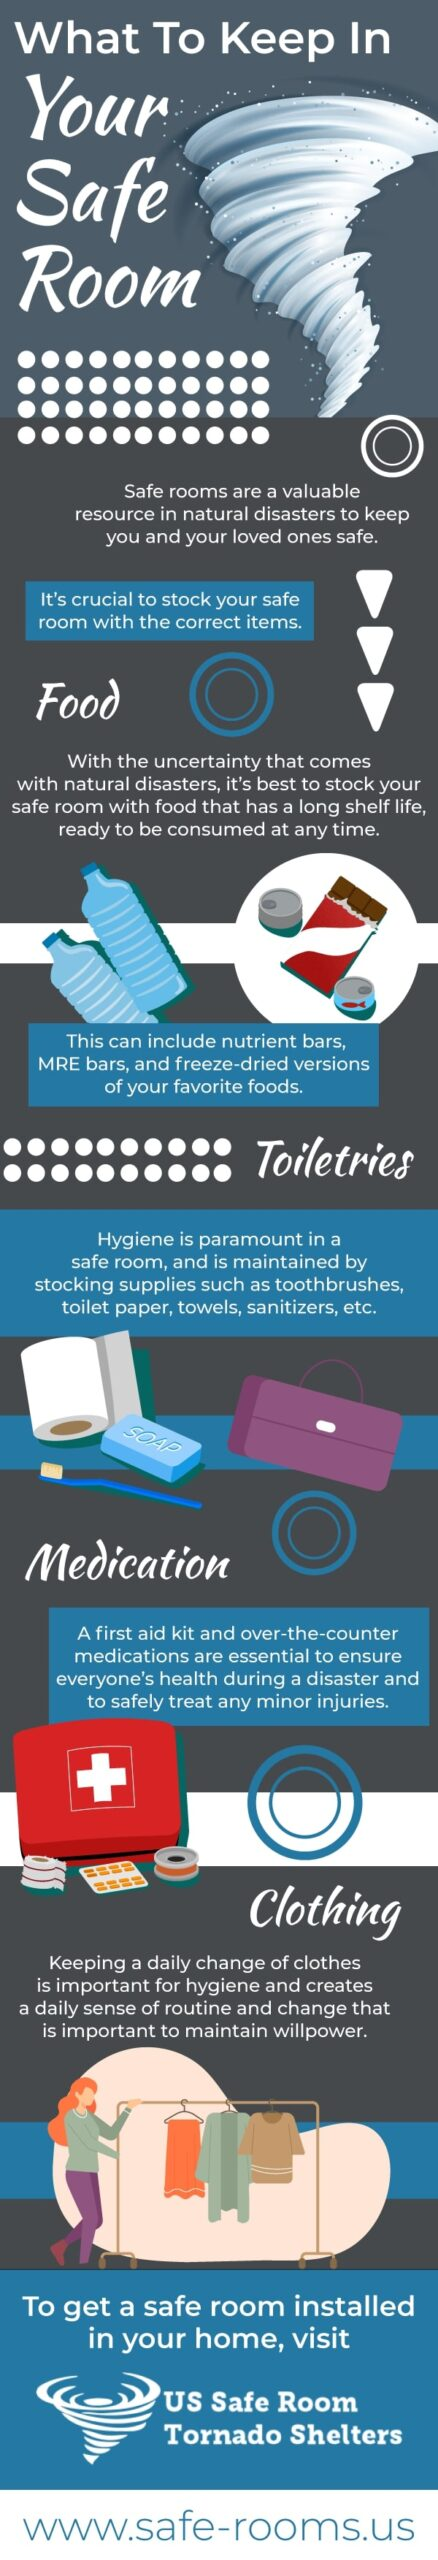 safe room essentials